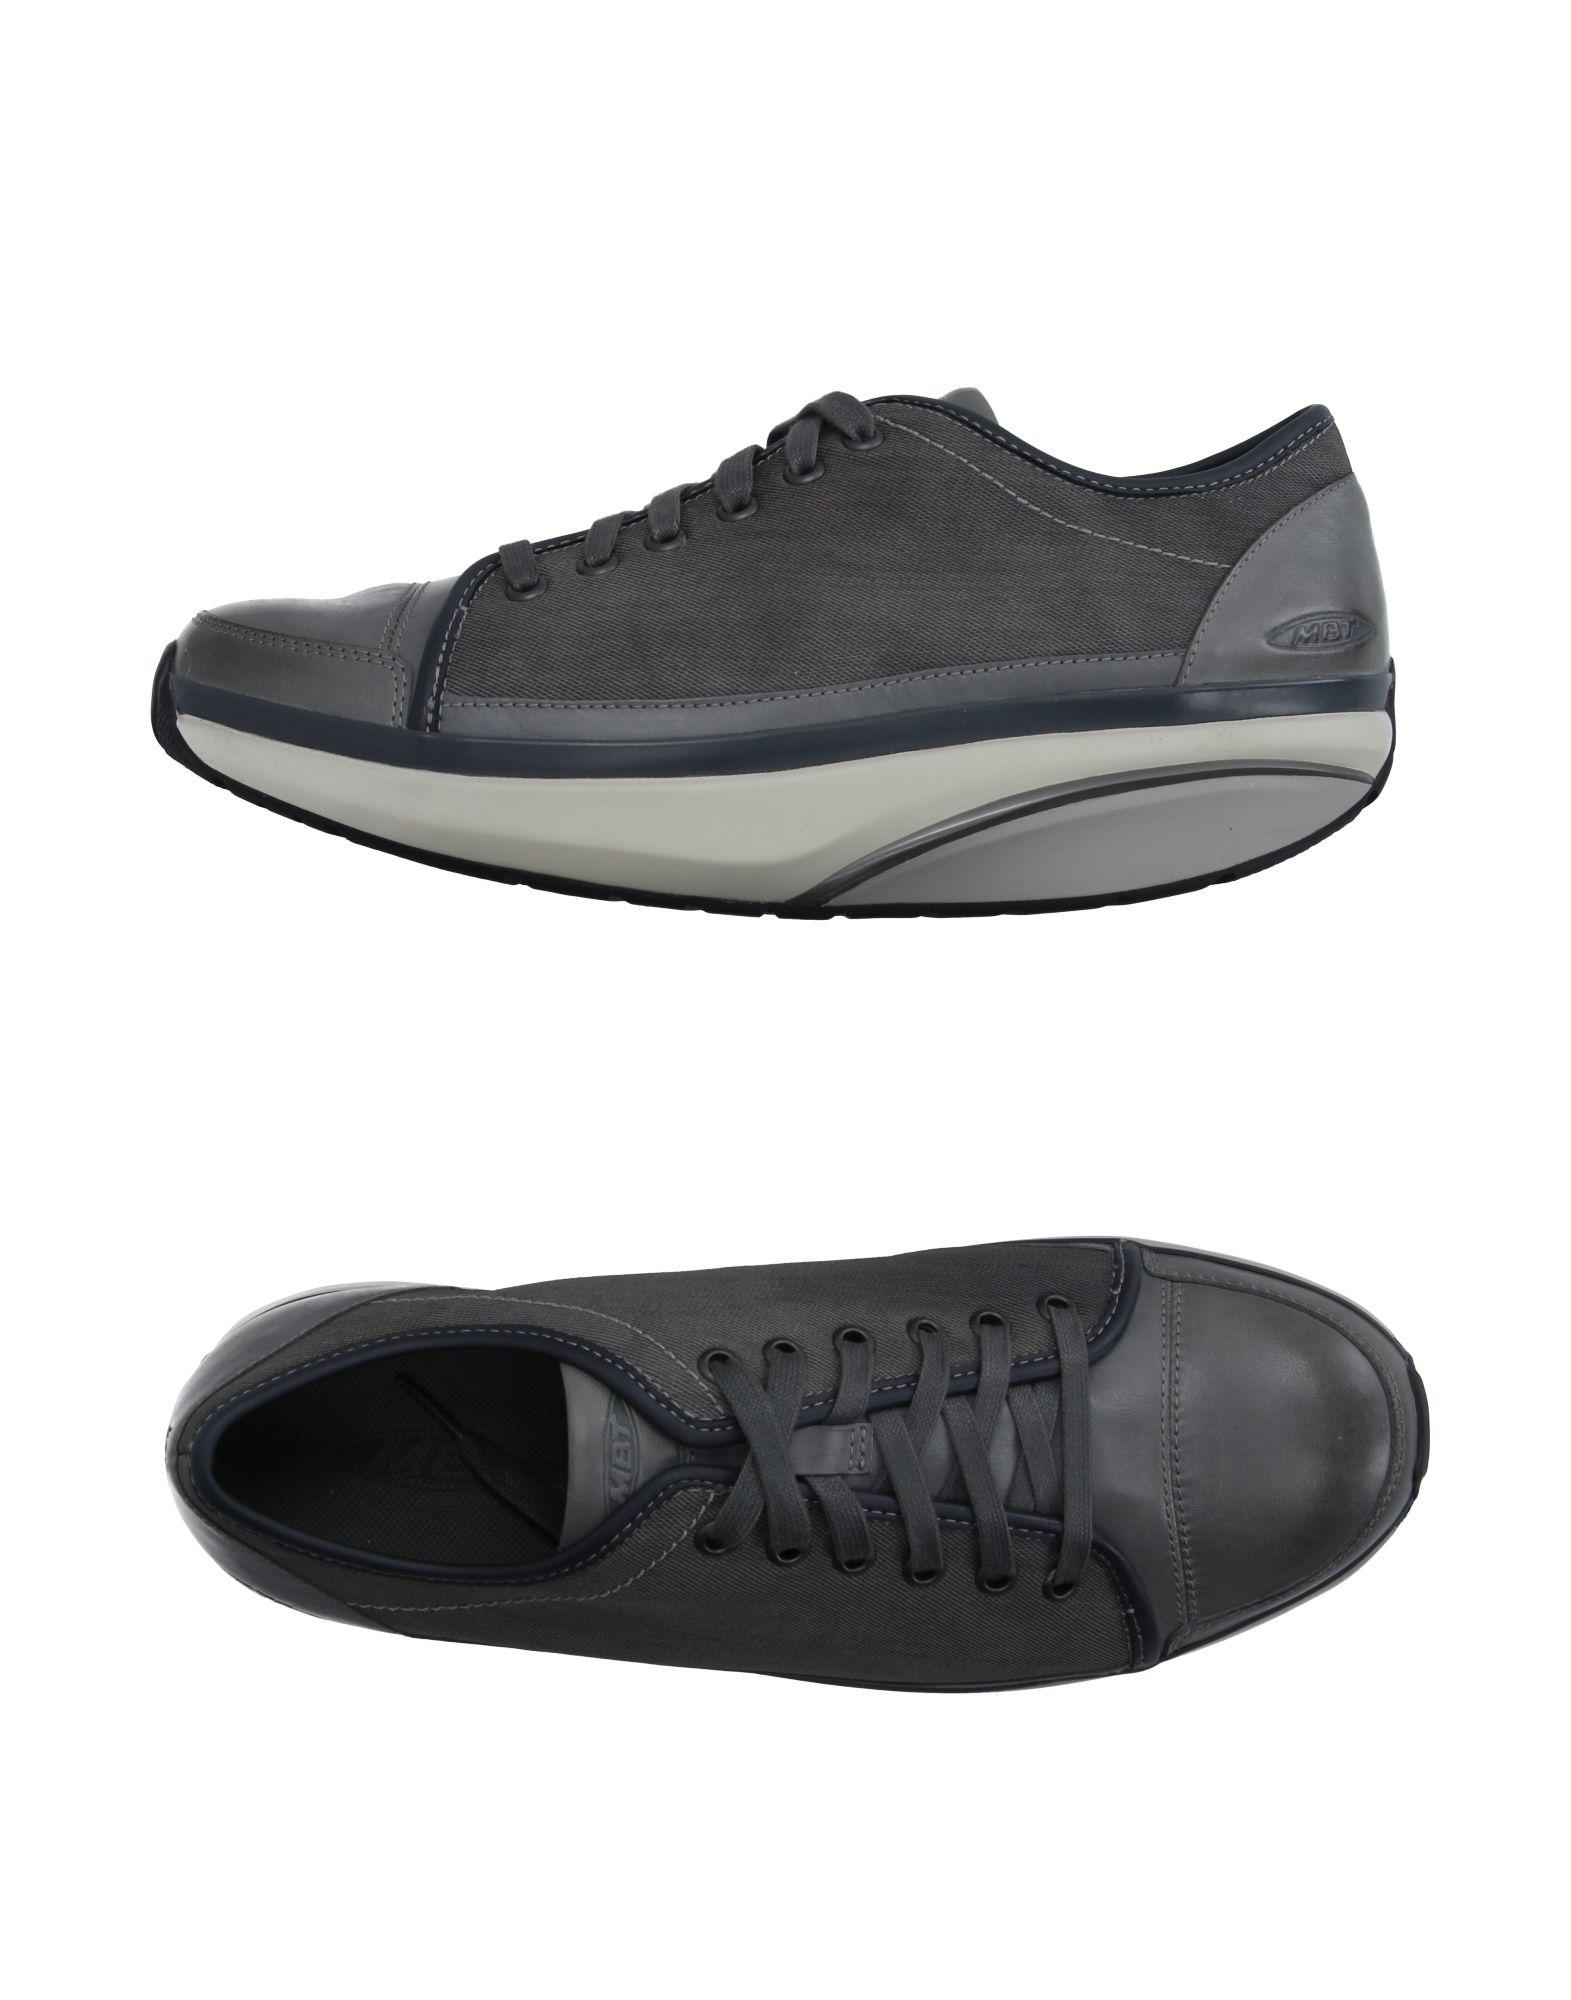 Sneakers Mbt Homme - Sneakers Mbt  Plomb Remise de marque